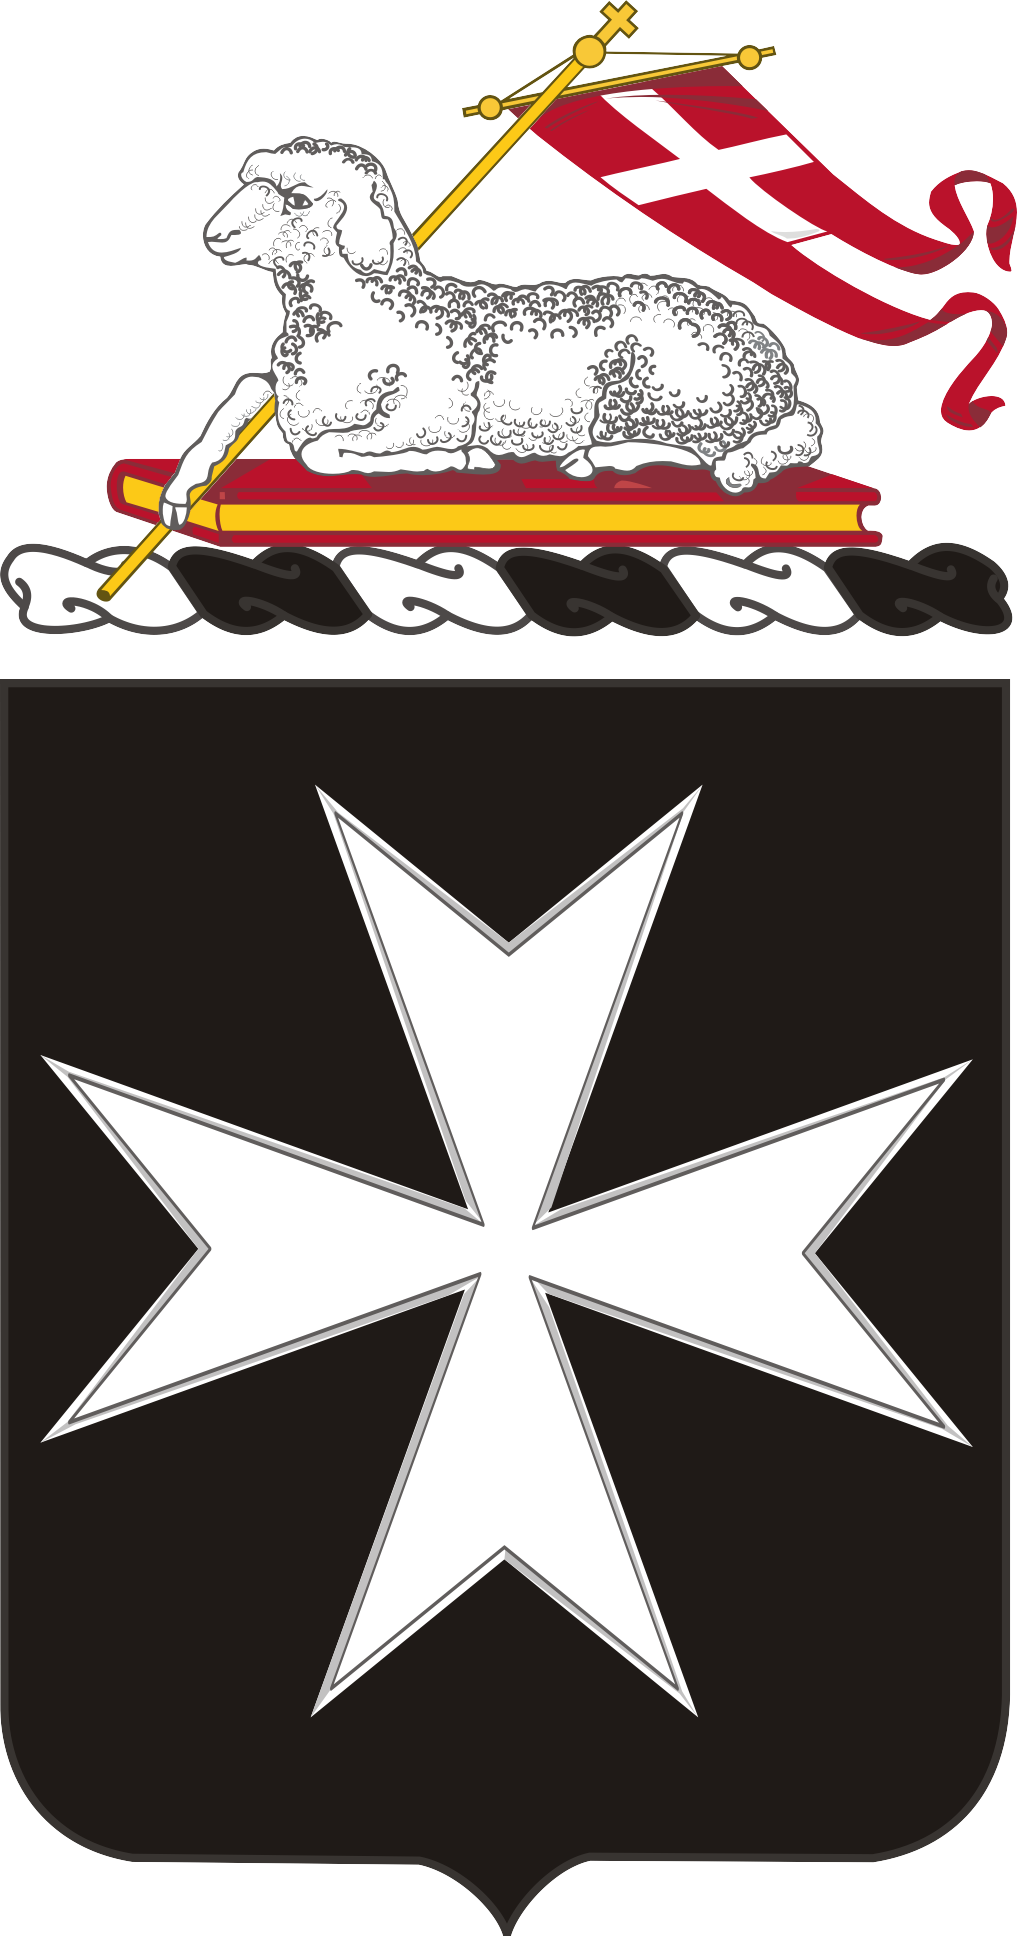 65th Infantry Regiment United States